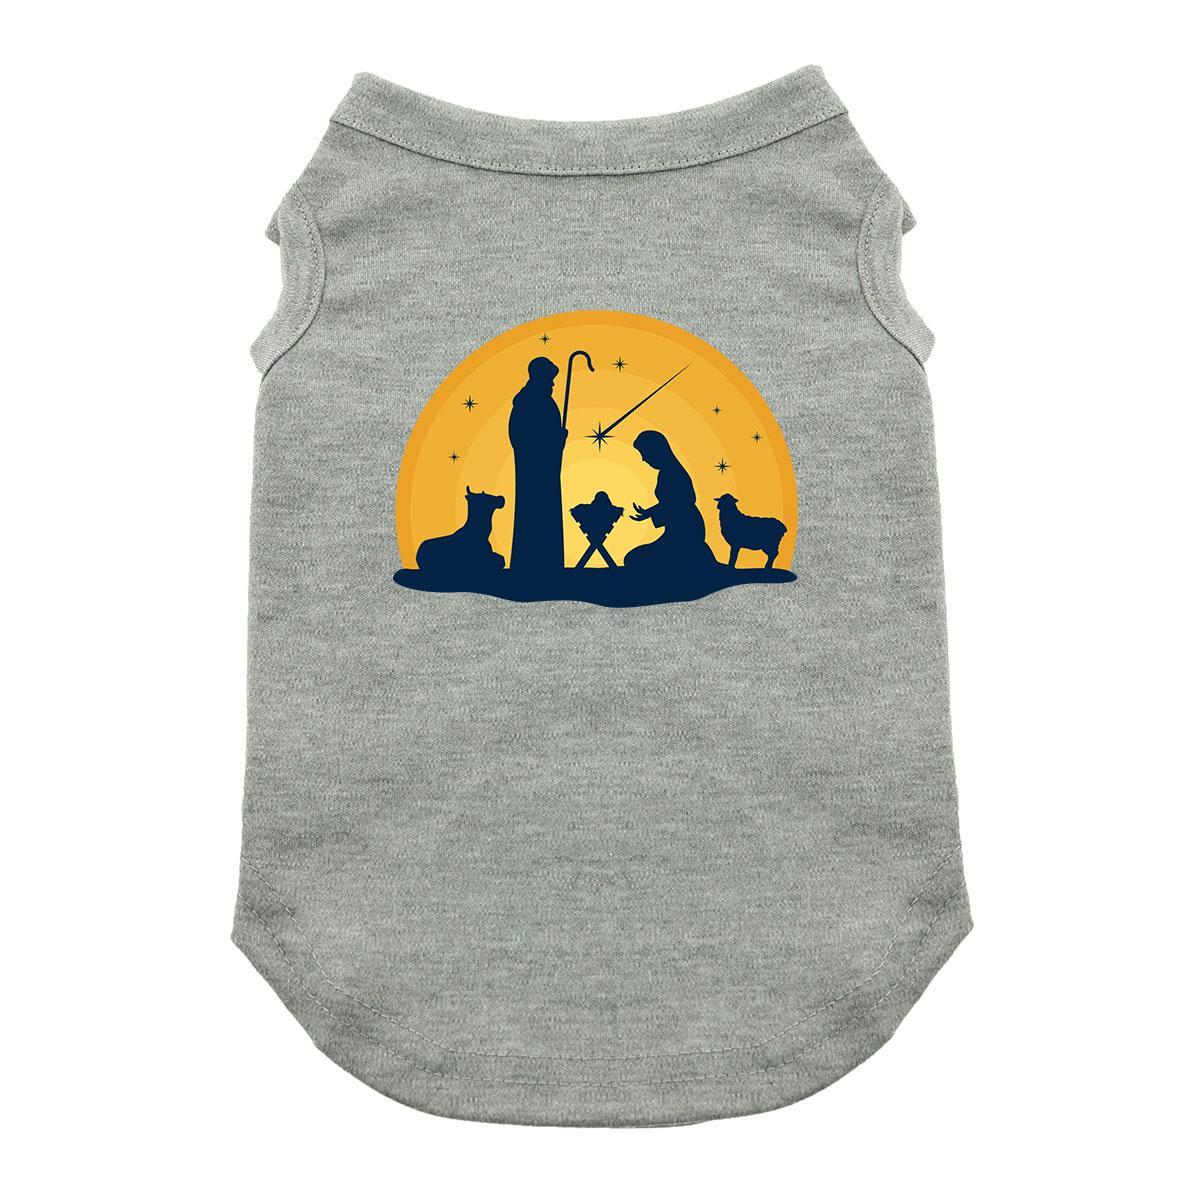 Nativity Scene Dog Shirt - Gray